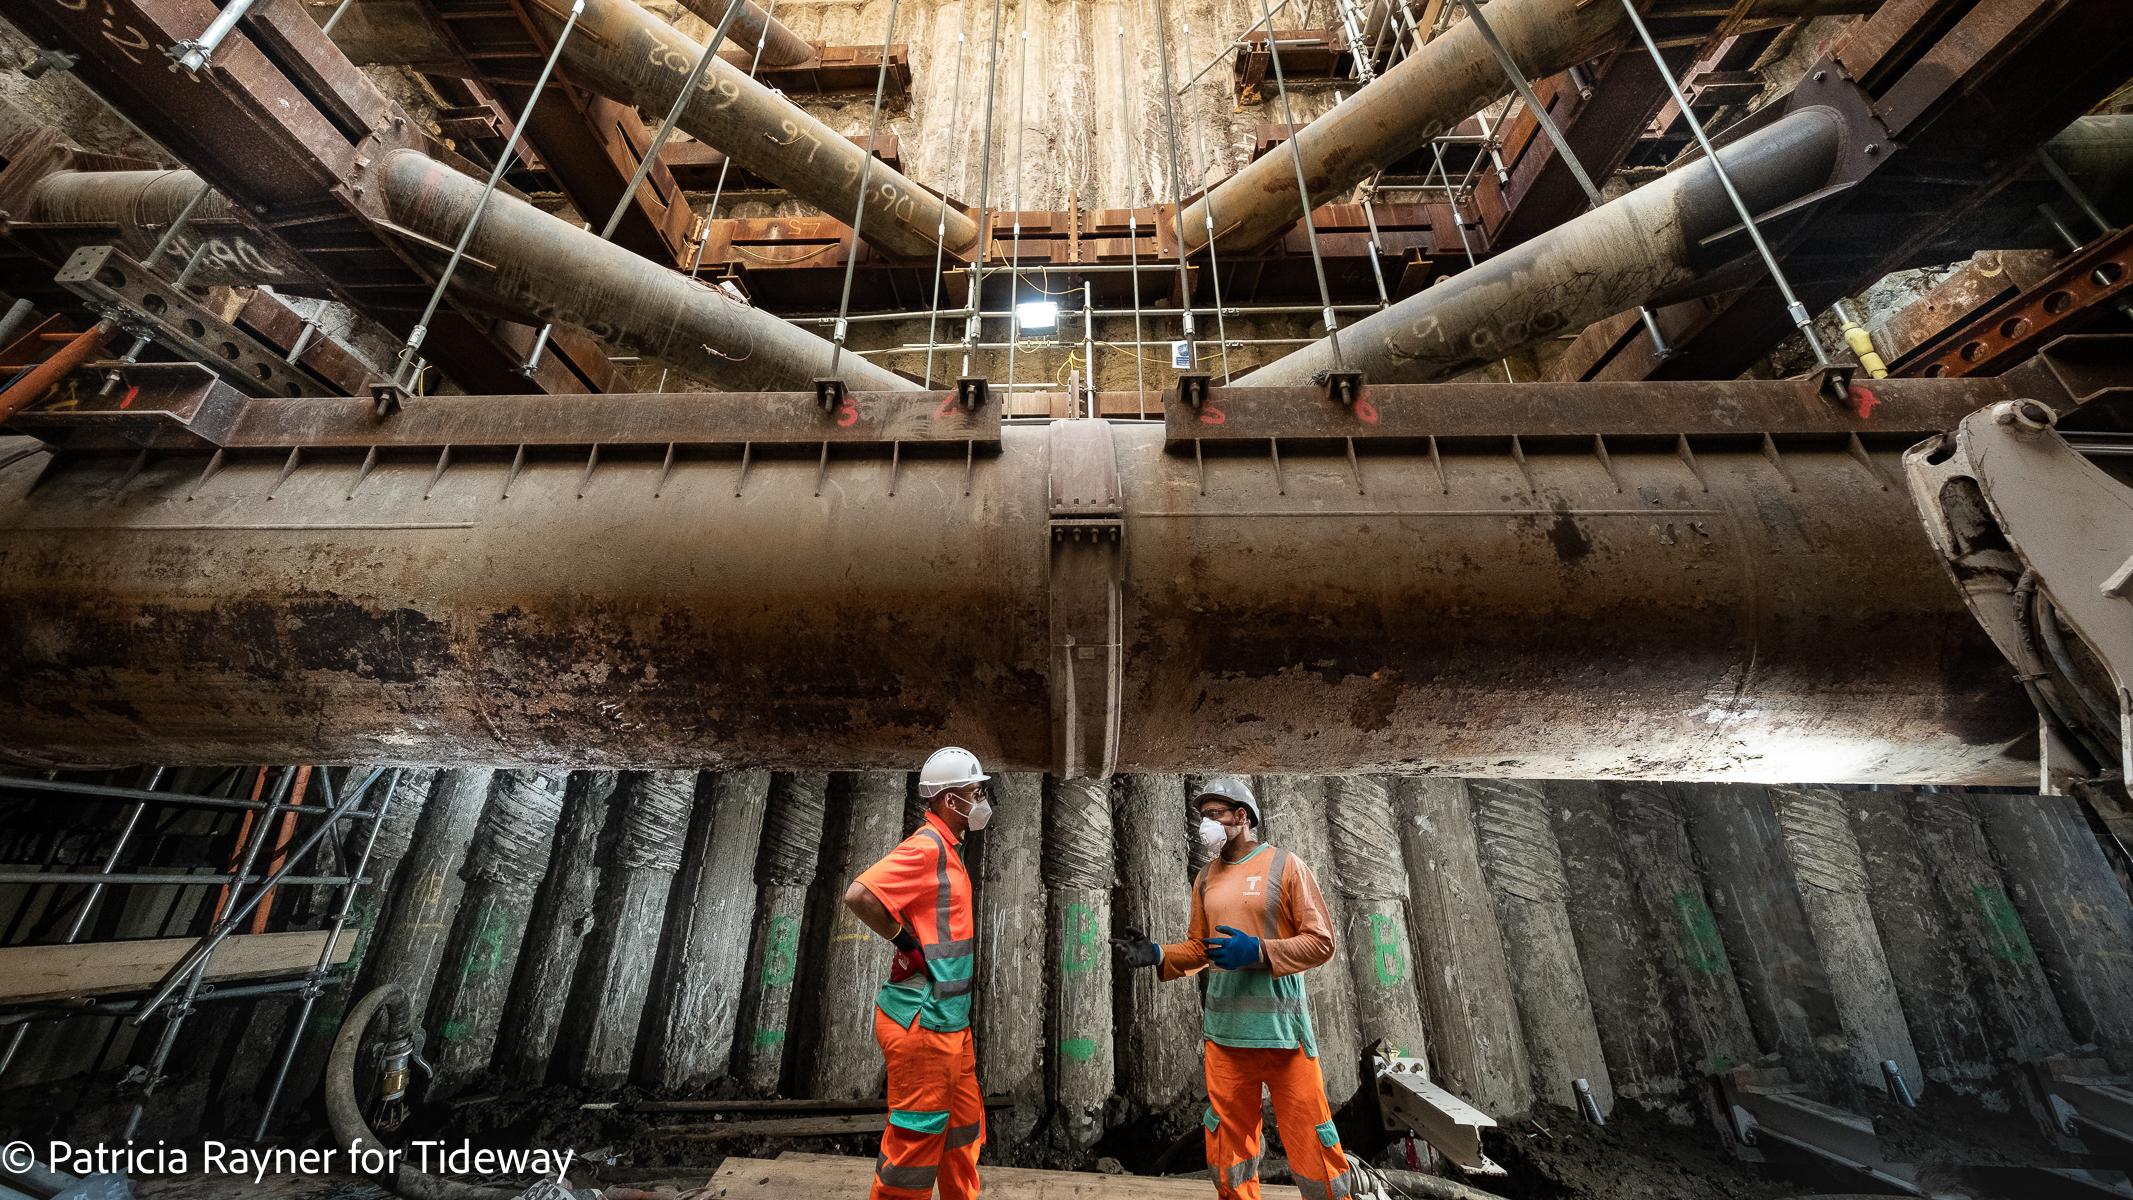 Tideway Construction Tunnel